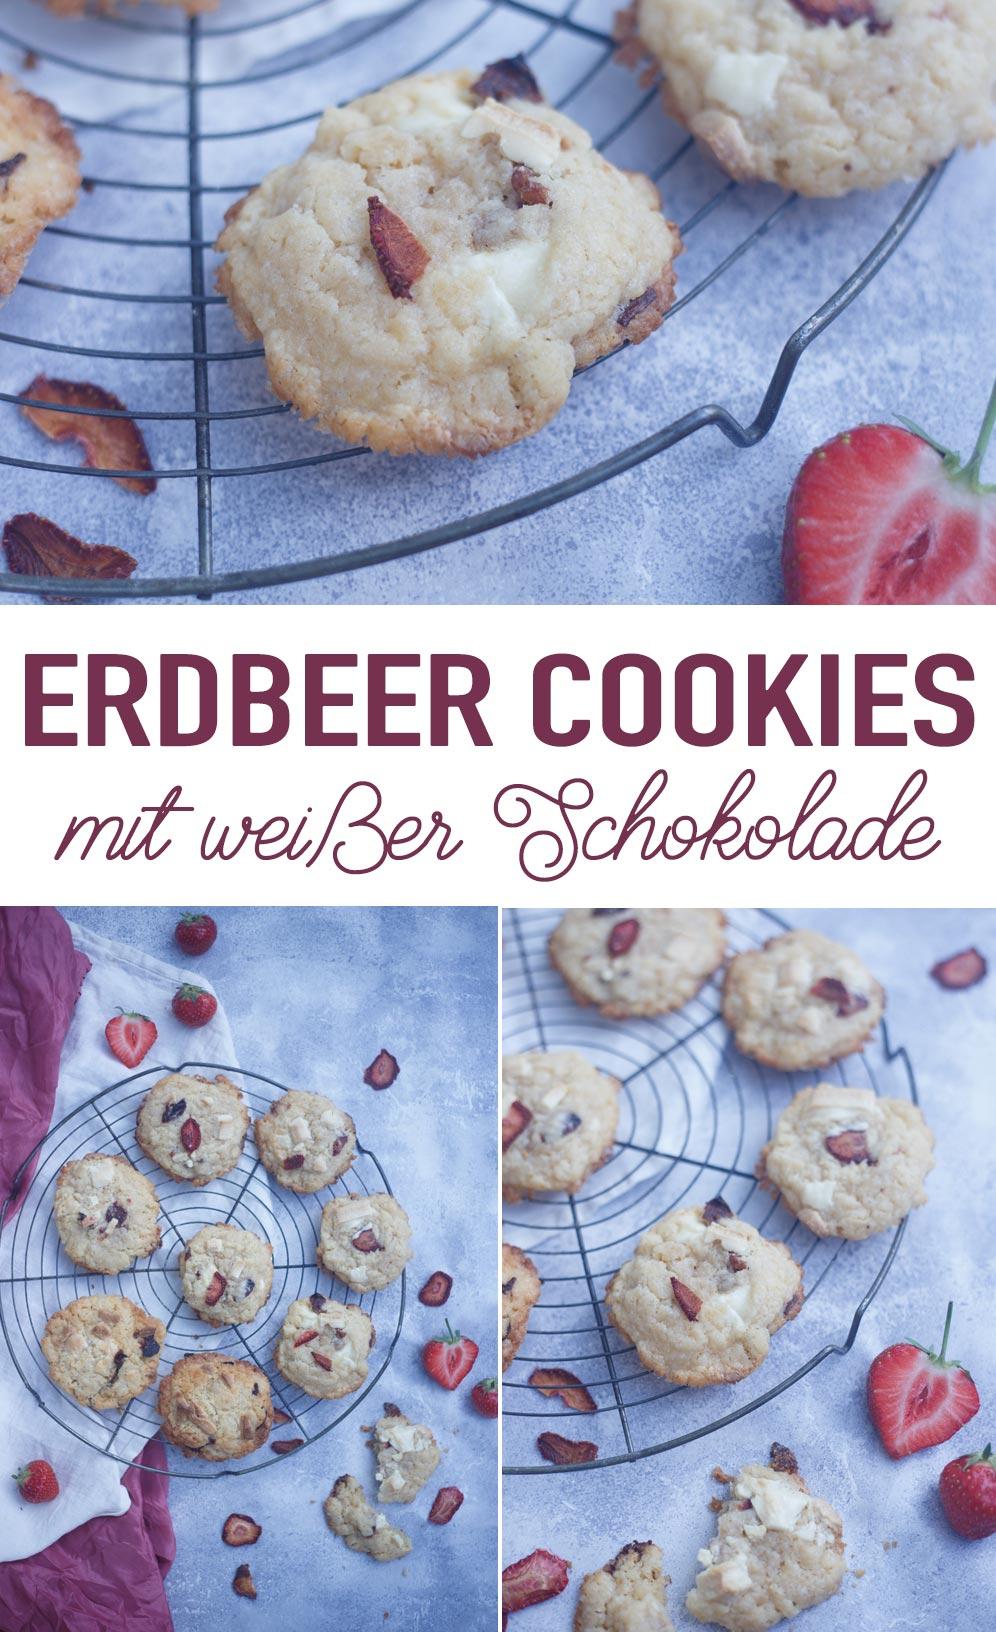 Erdbeer Cookies mit weißer Schokolade und gedörrten Erdbeeren backen Rezeptidee